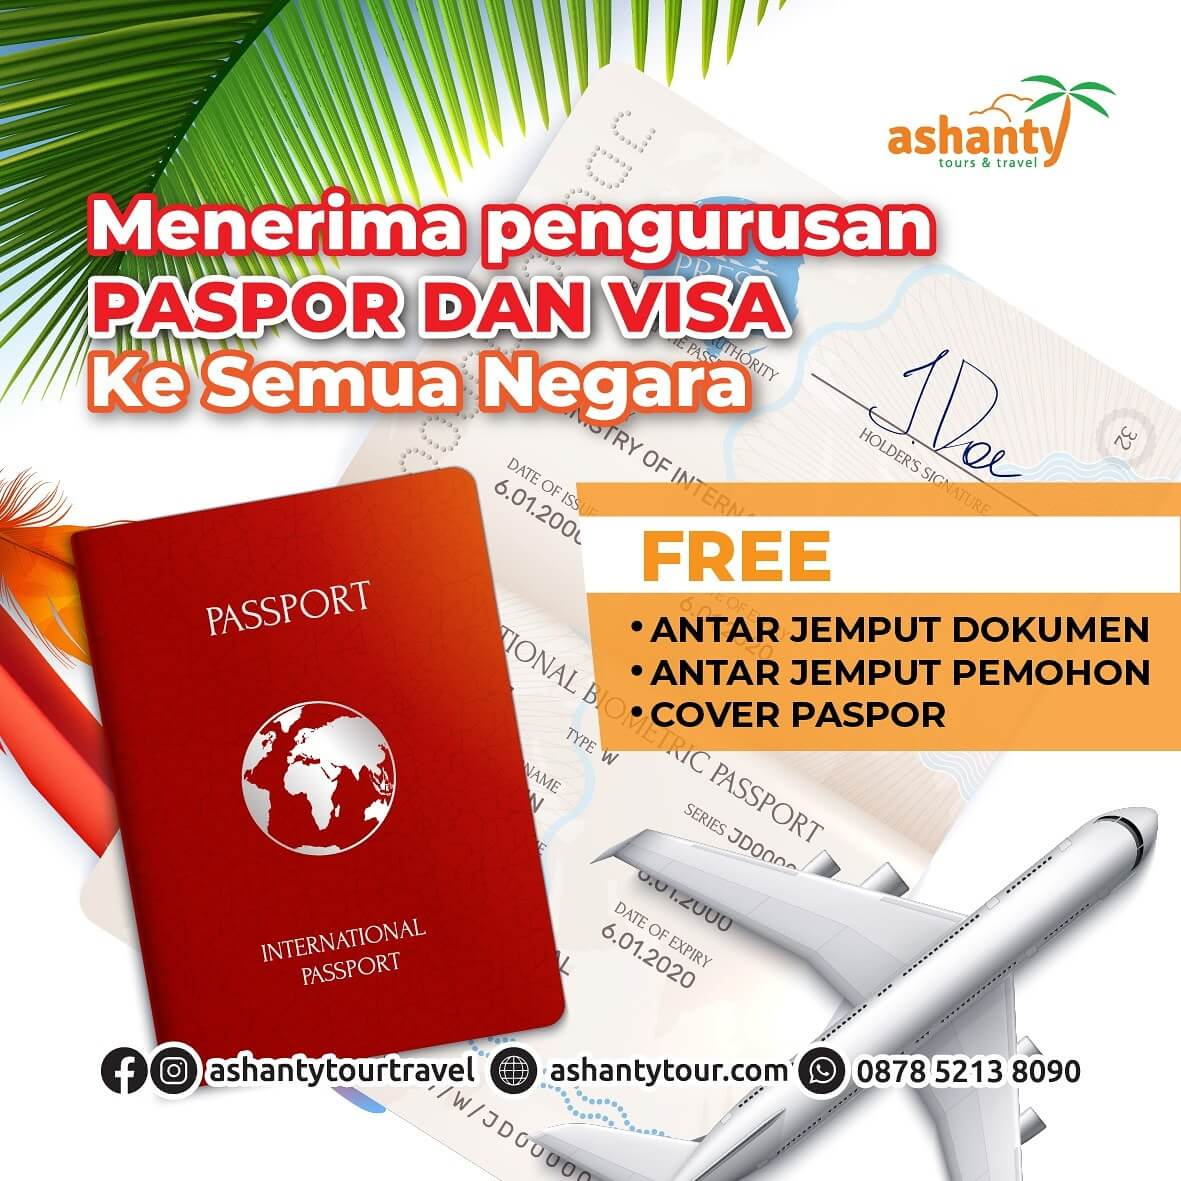 biro jasa pengurusan paspor surabaya, jasa perpanjangan paspor surabaya, jasa paspor kilat surabaya, jasa paspor murah surabaya, jasa pembuatan paspor kilat surabaya